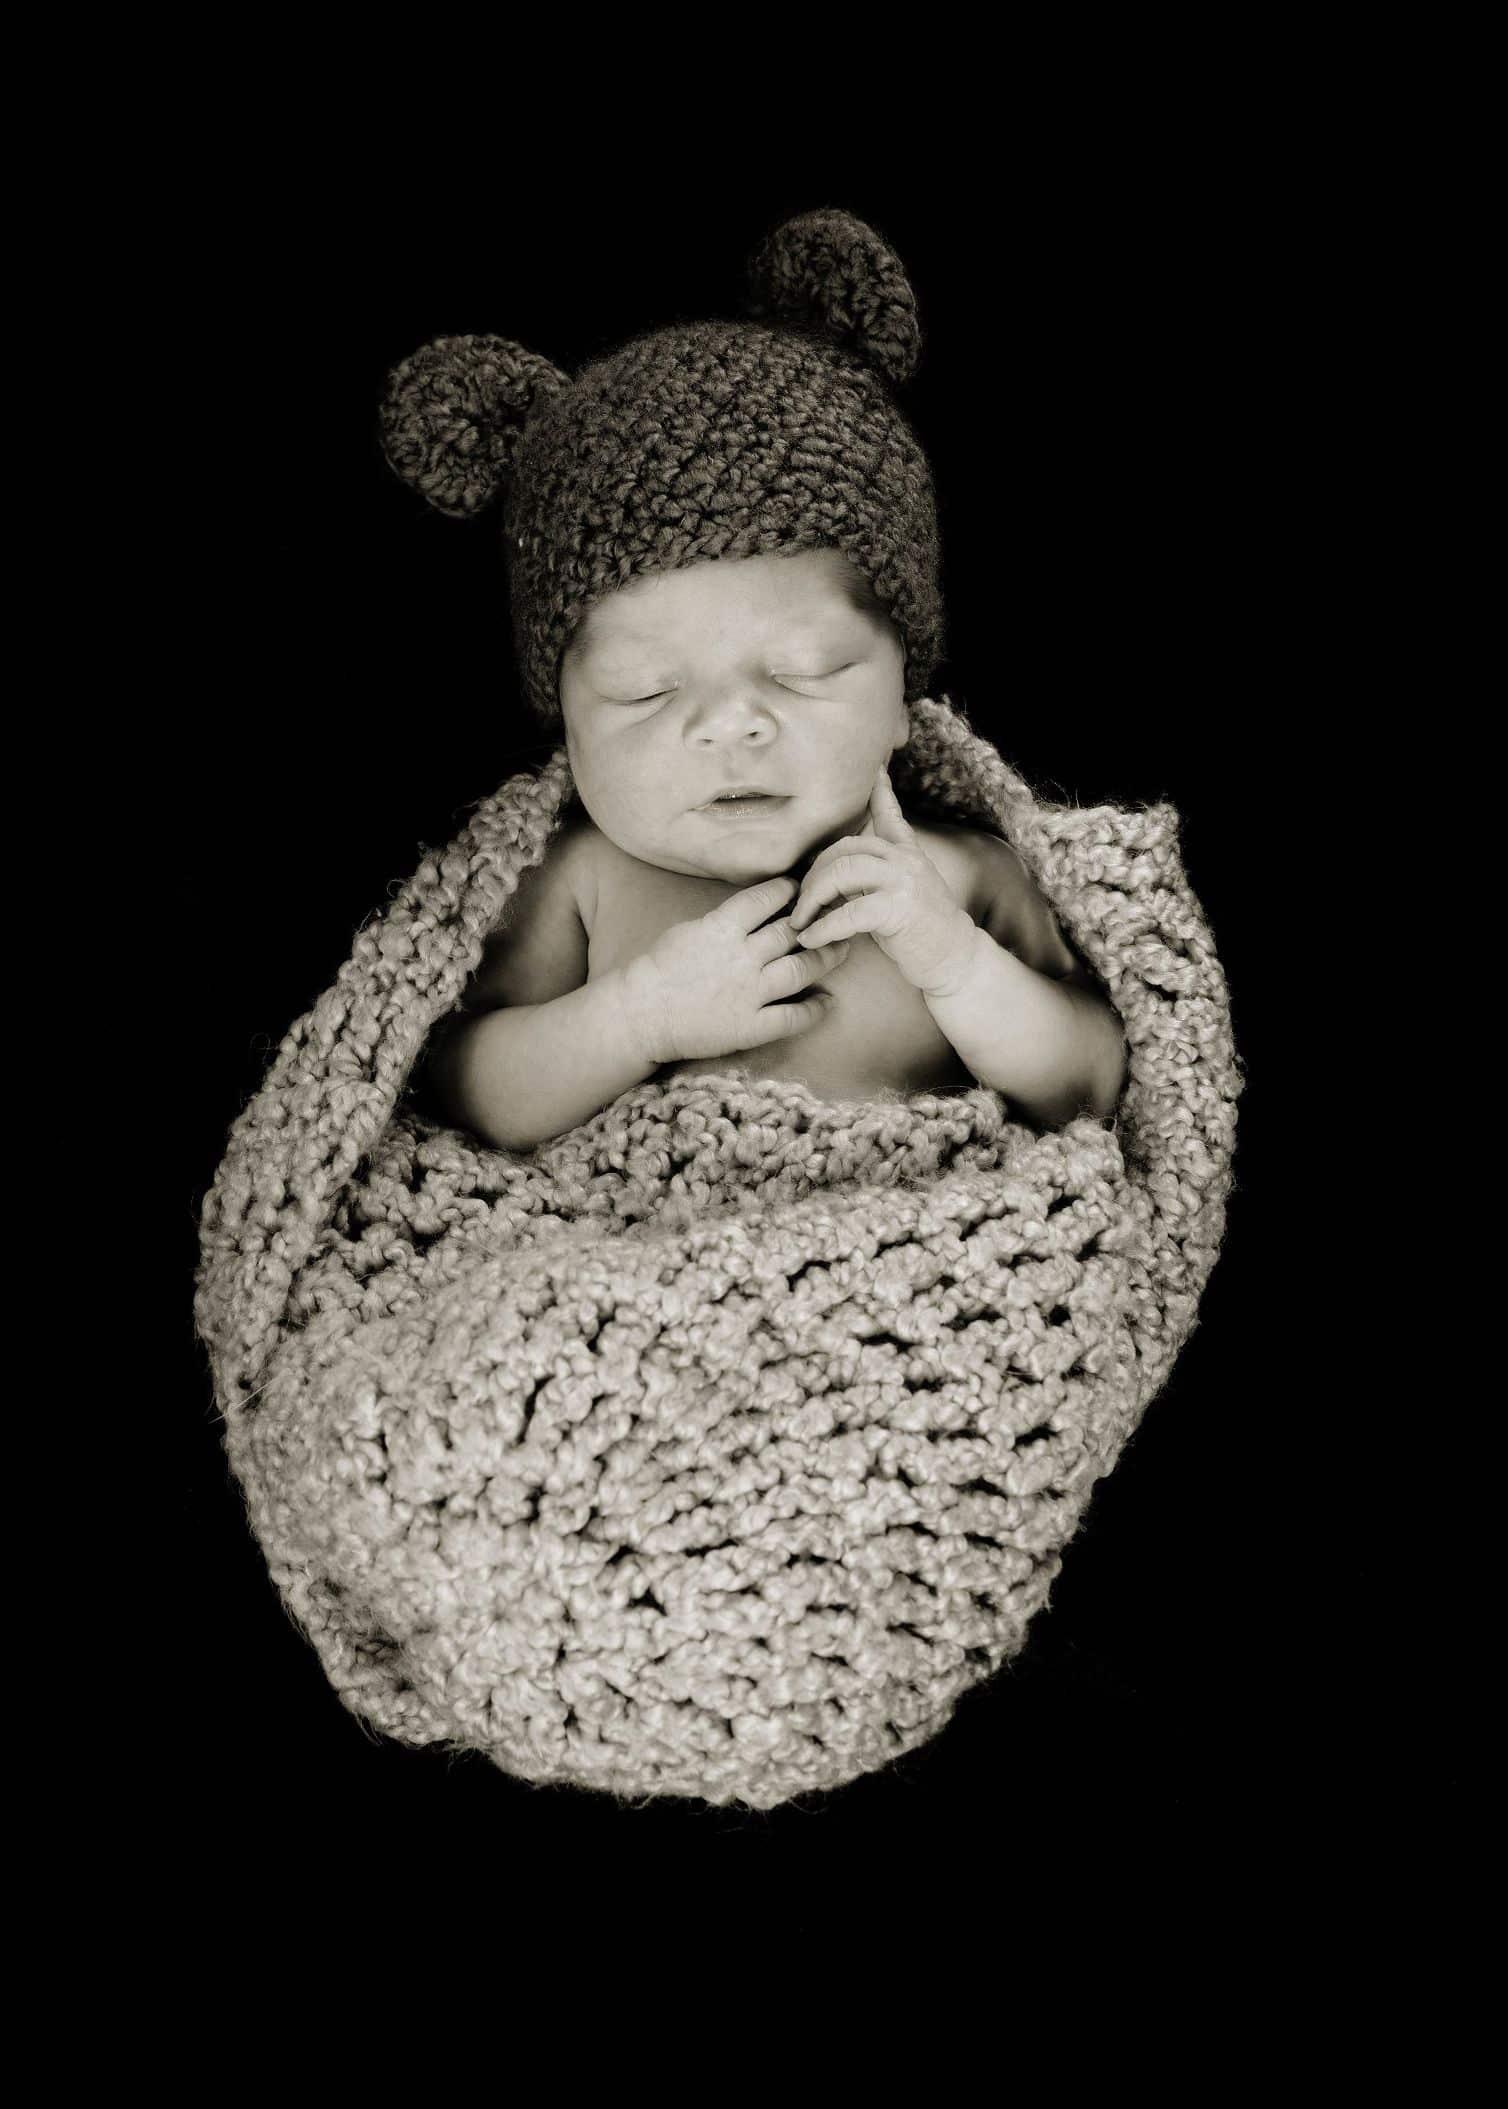 newborn in knitted blanket